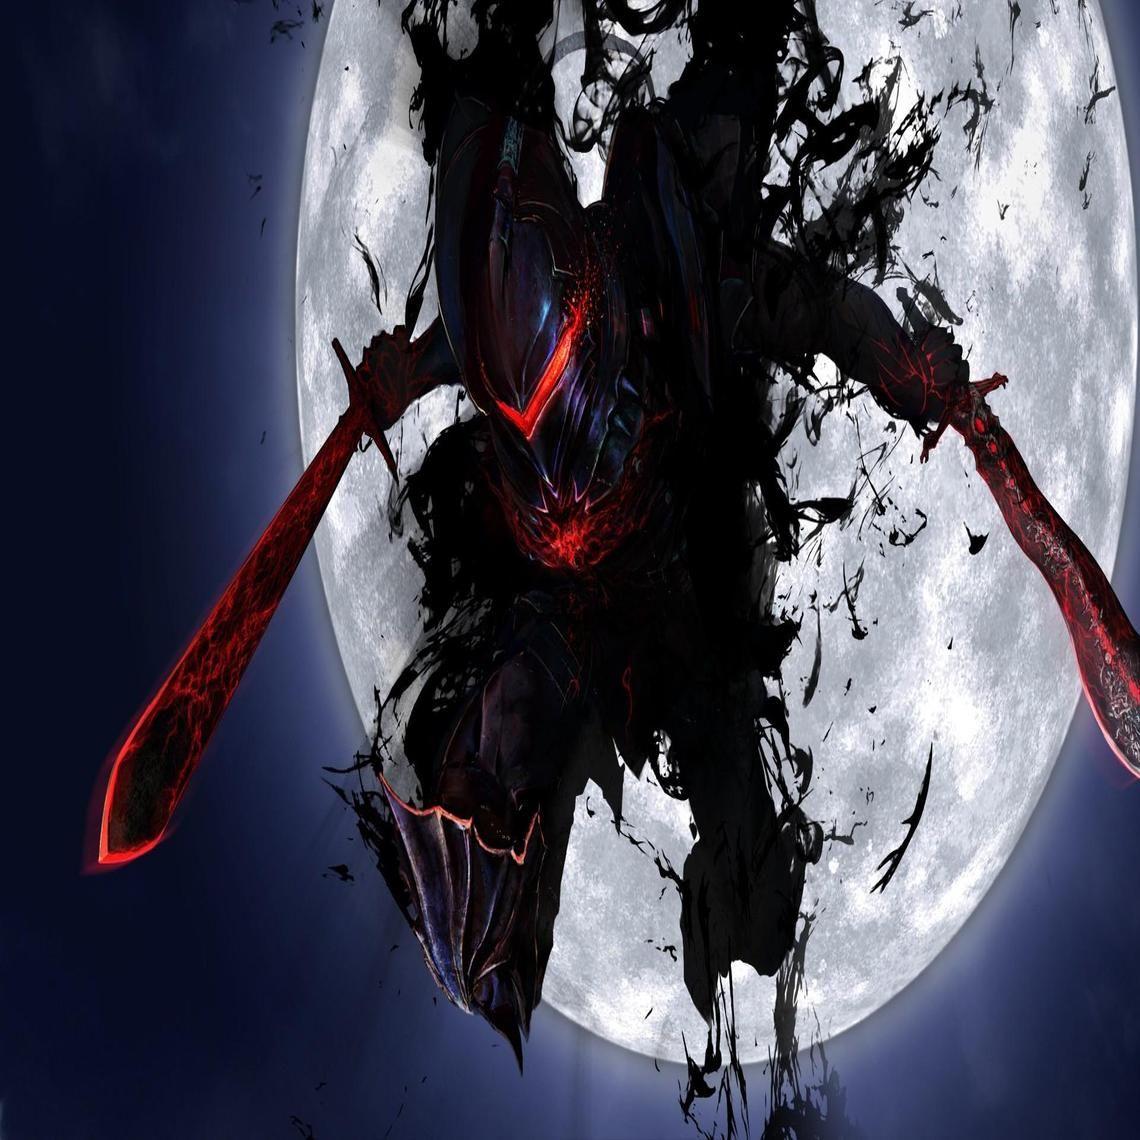 BERSERKER FATE ZERO Anime hd, Anime oscuro, Fondo de anime